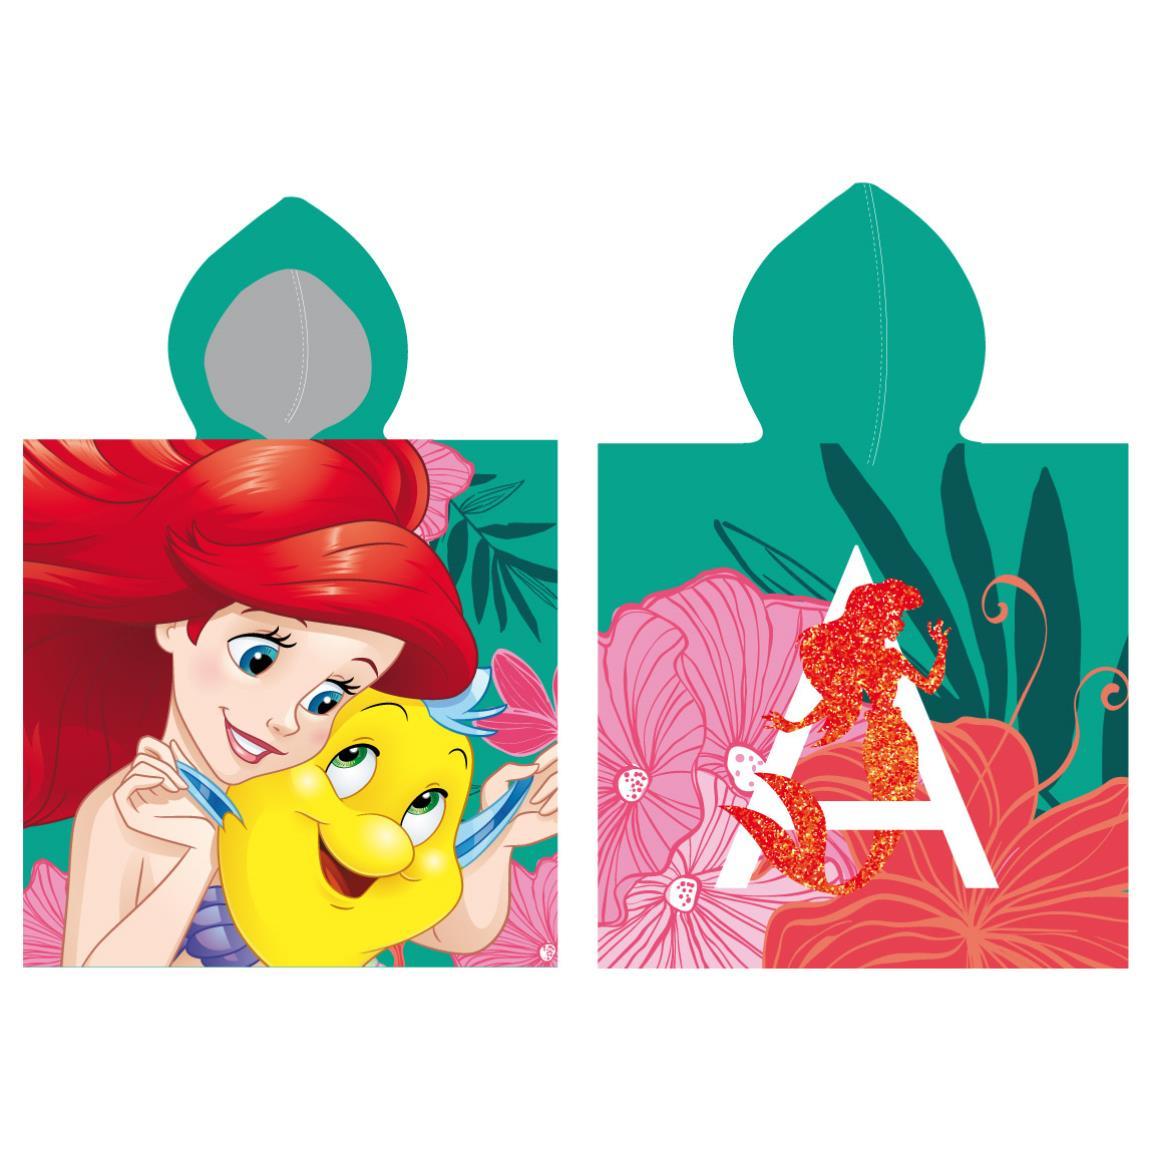 Prosop de plaja cu imprimeu total, Disney Princess imagine